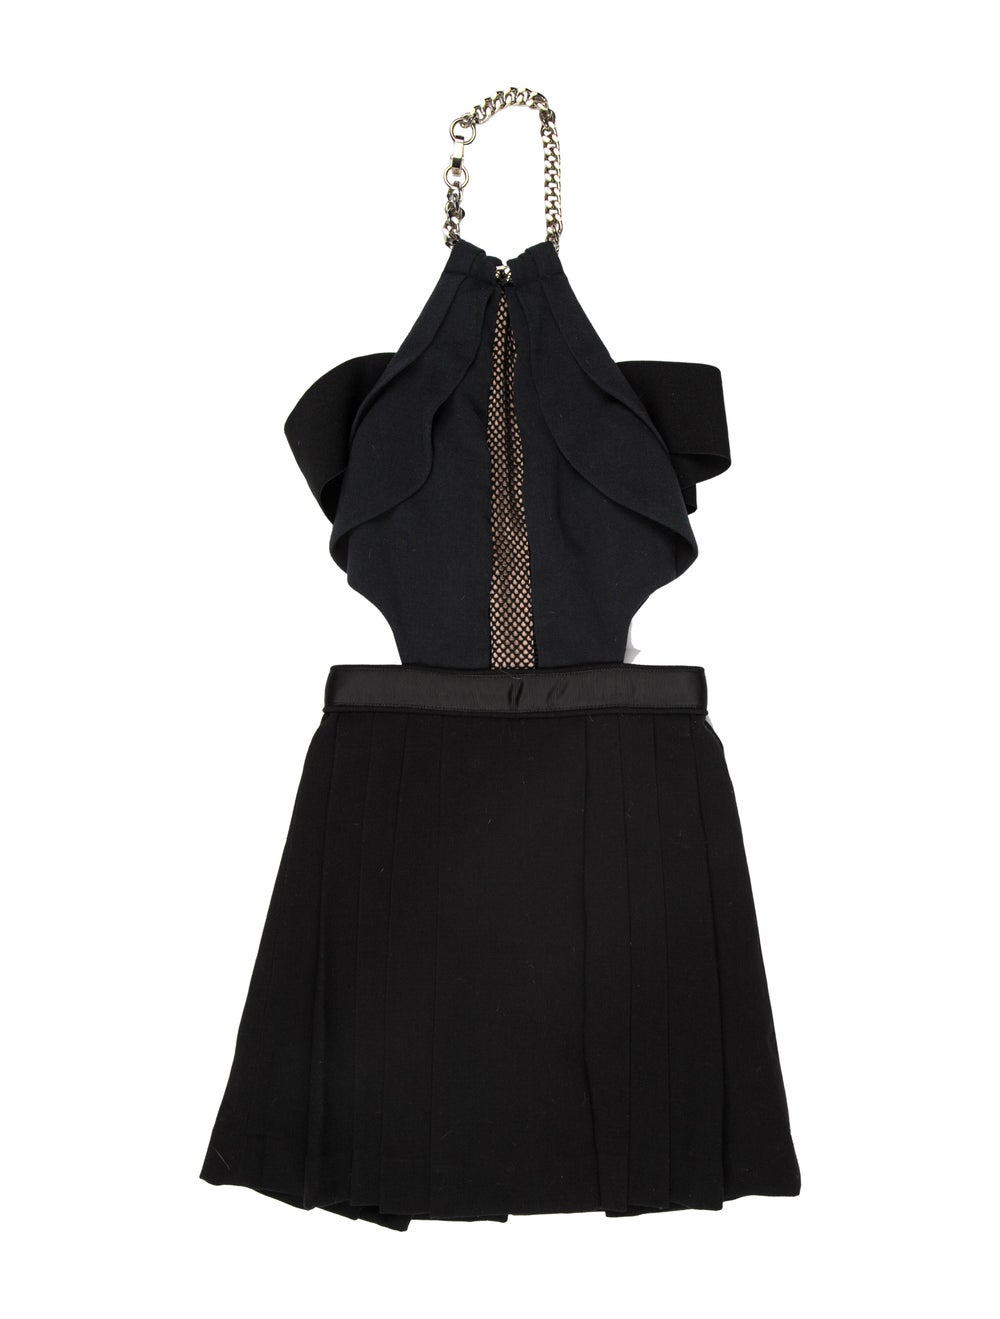 Self-Portrait Halterneck Mini Dress Black - image 1